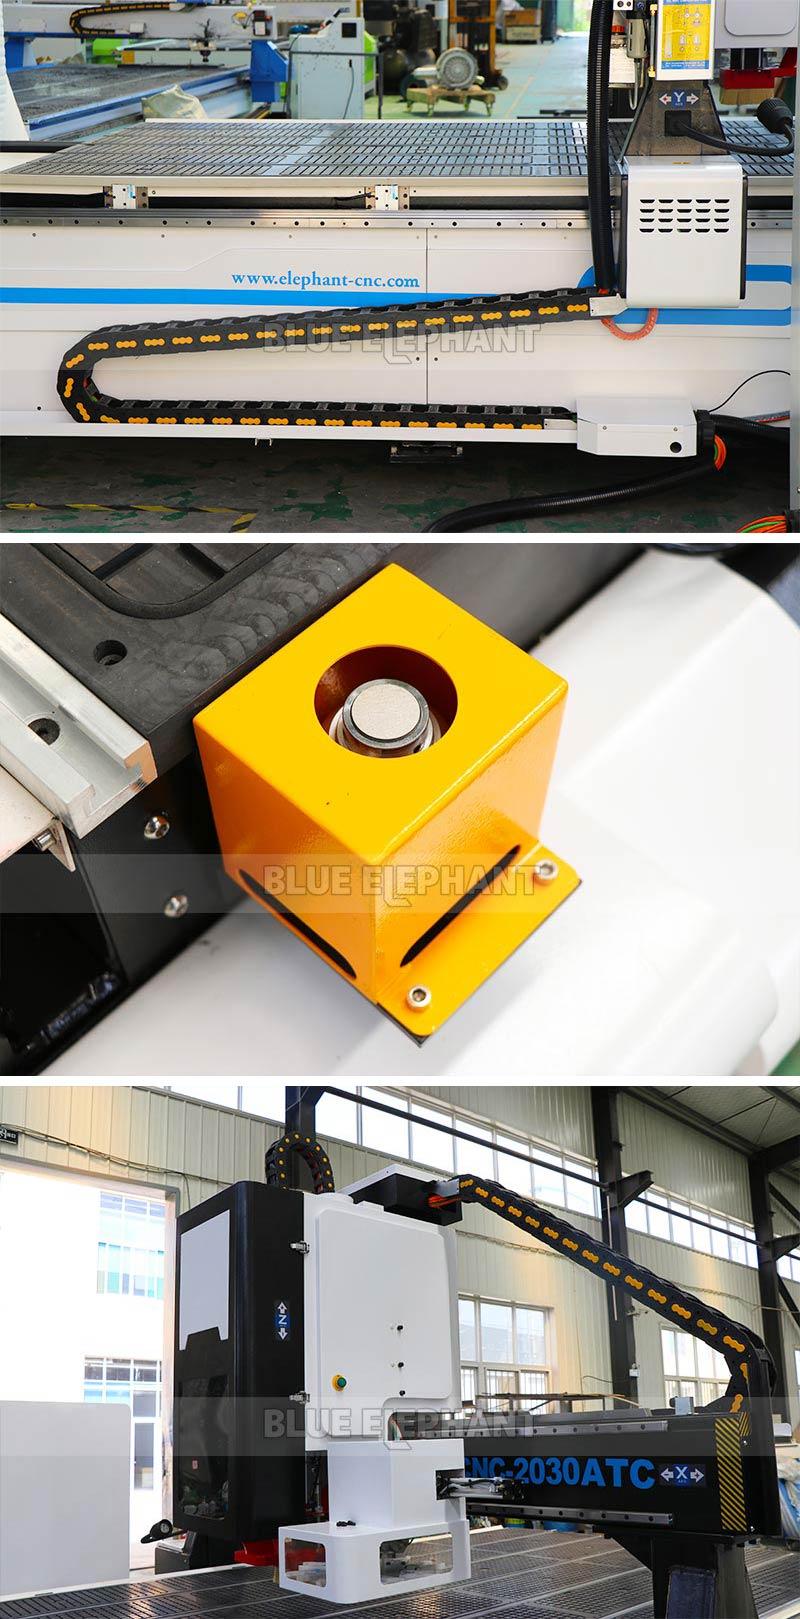 CATC-2030 CNC Machine